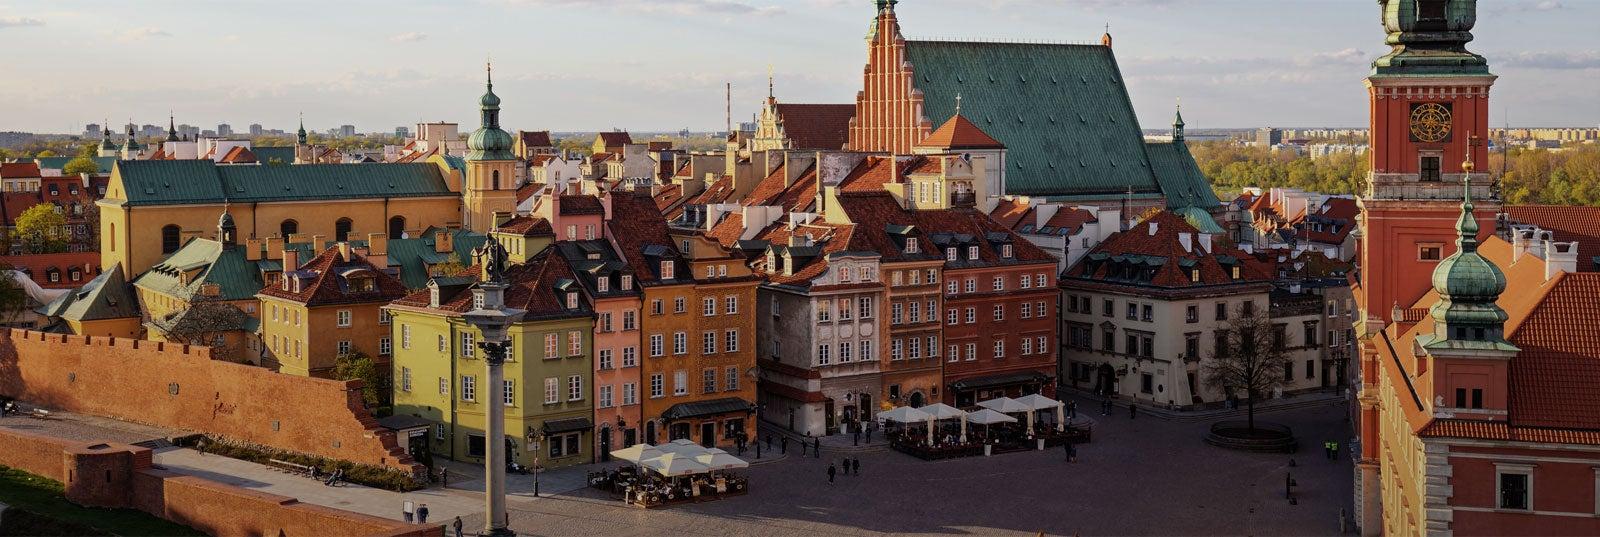 Guía turística de Varsavia